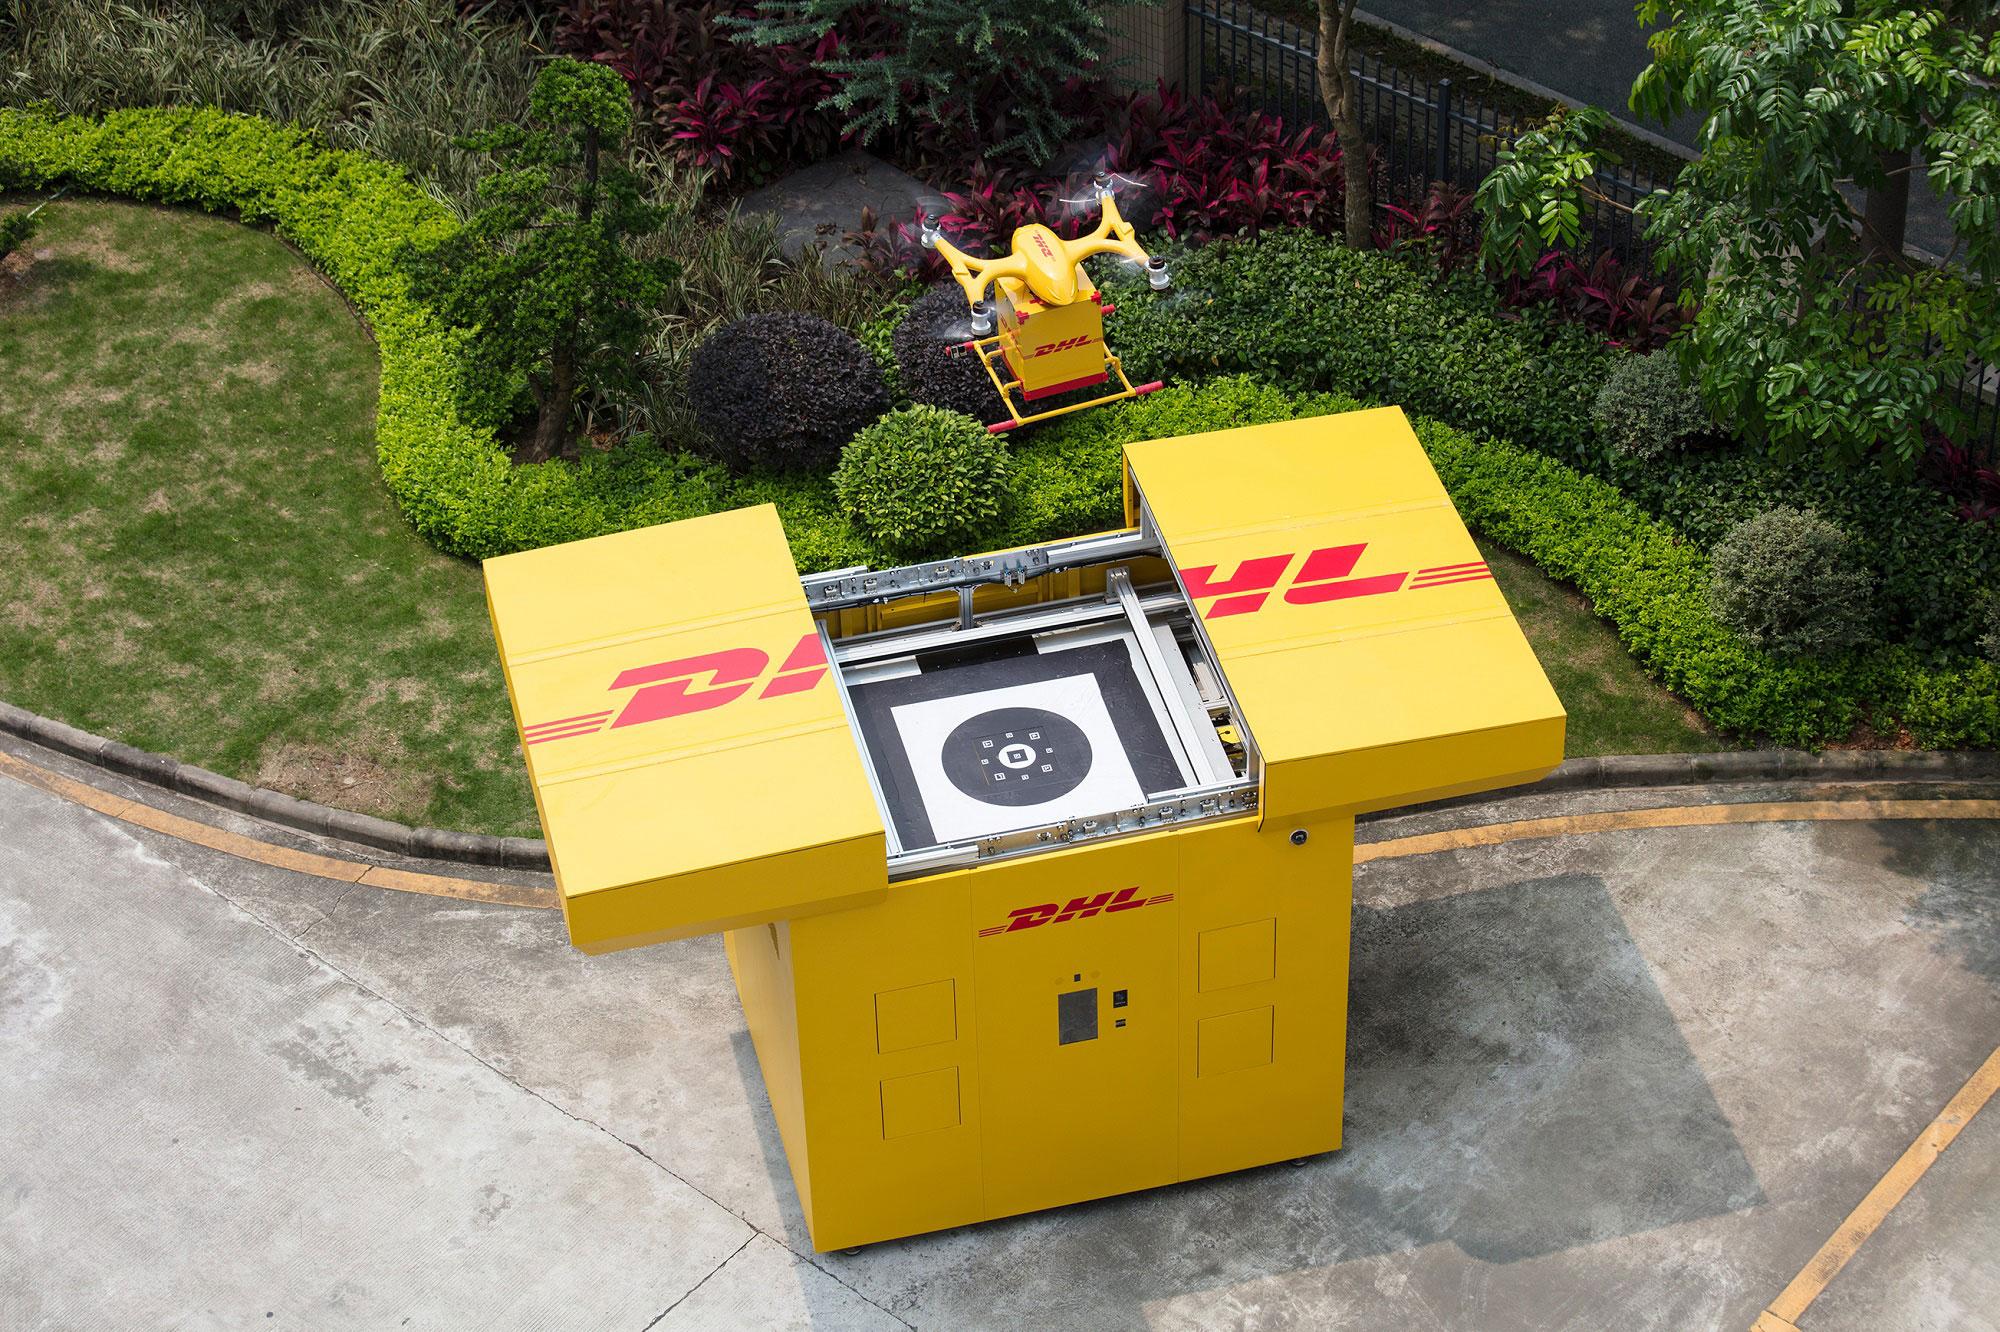 dhl-ekspress-drone-hizmeti.jpg